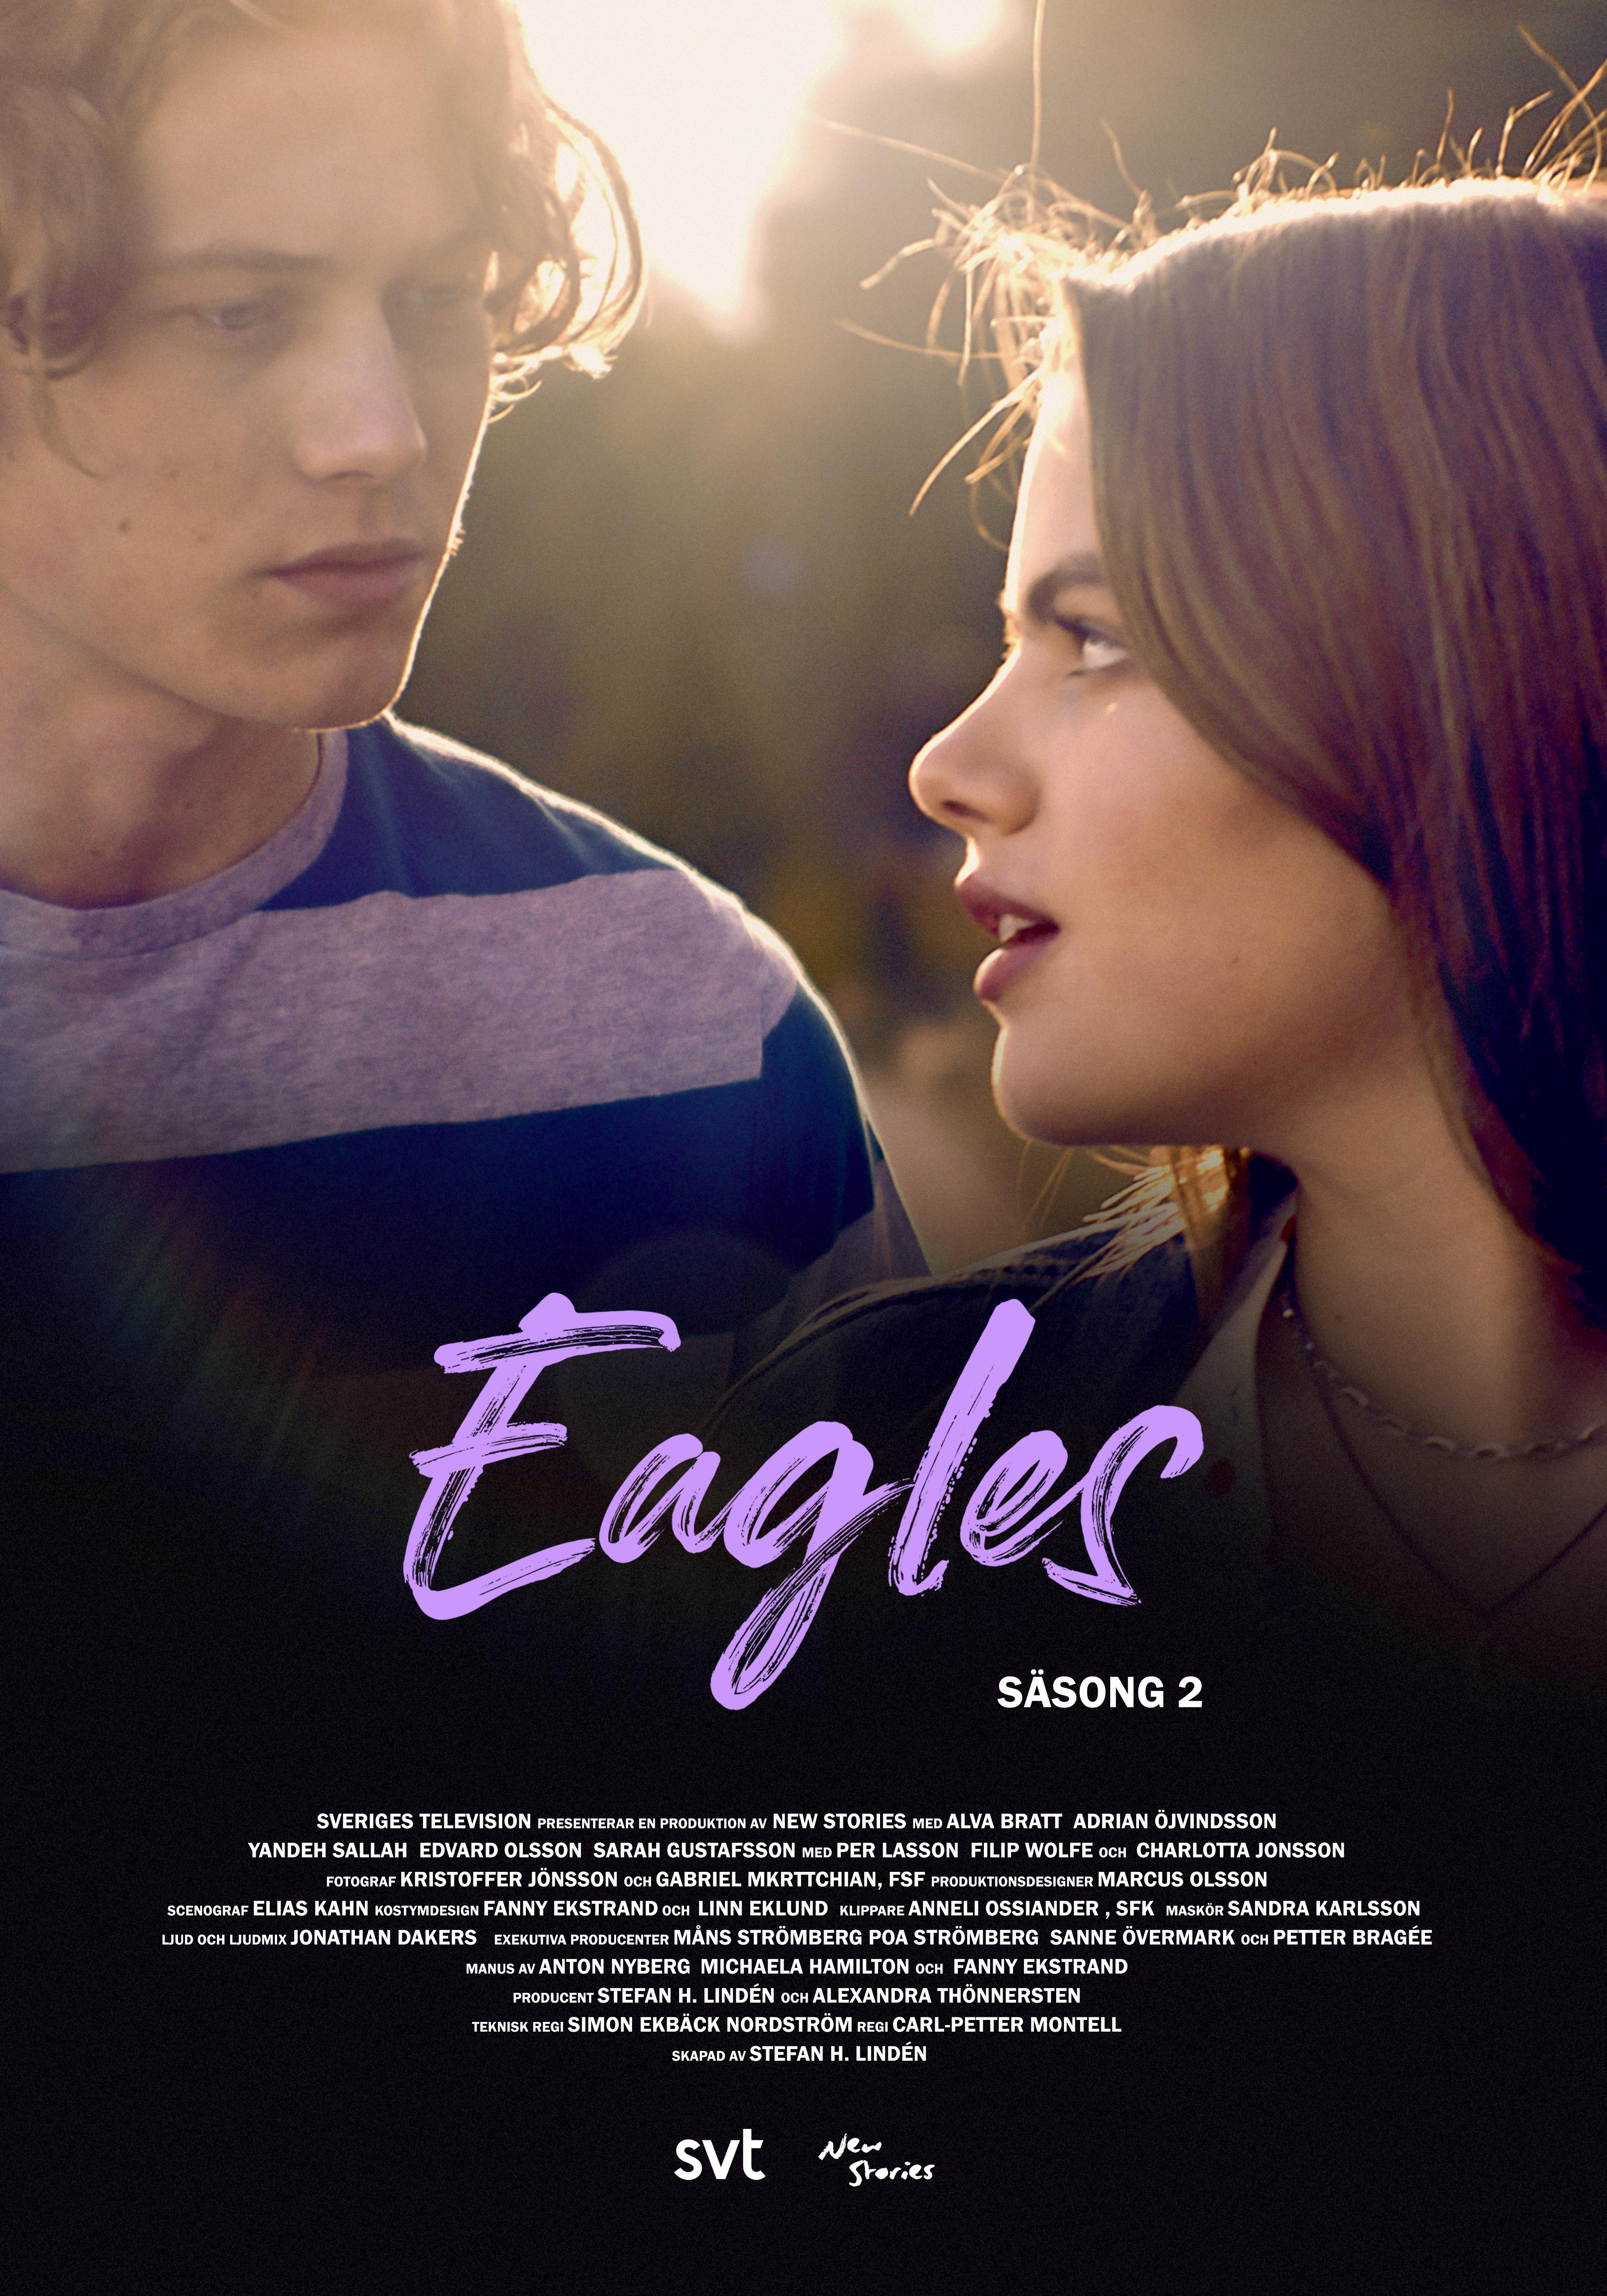 Eagles.S02E08.SWEDiSH.1080p.WEB.x264-DECAPiTATiON